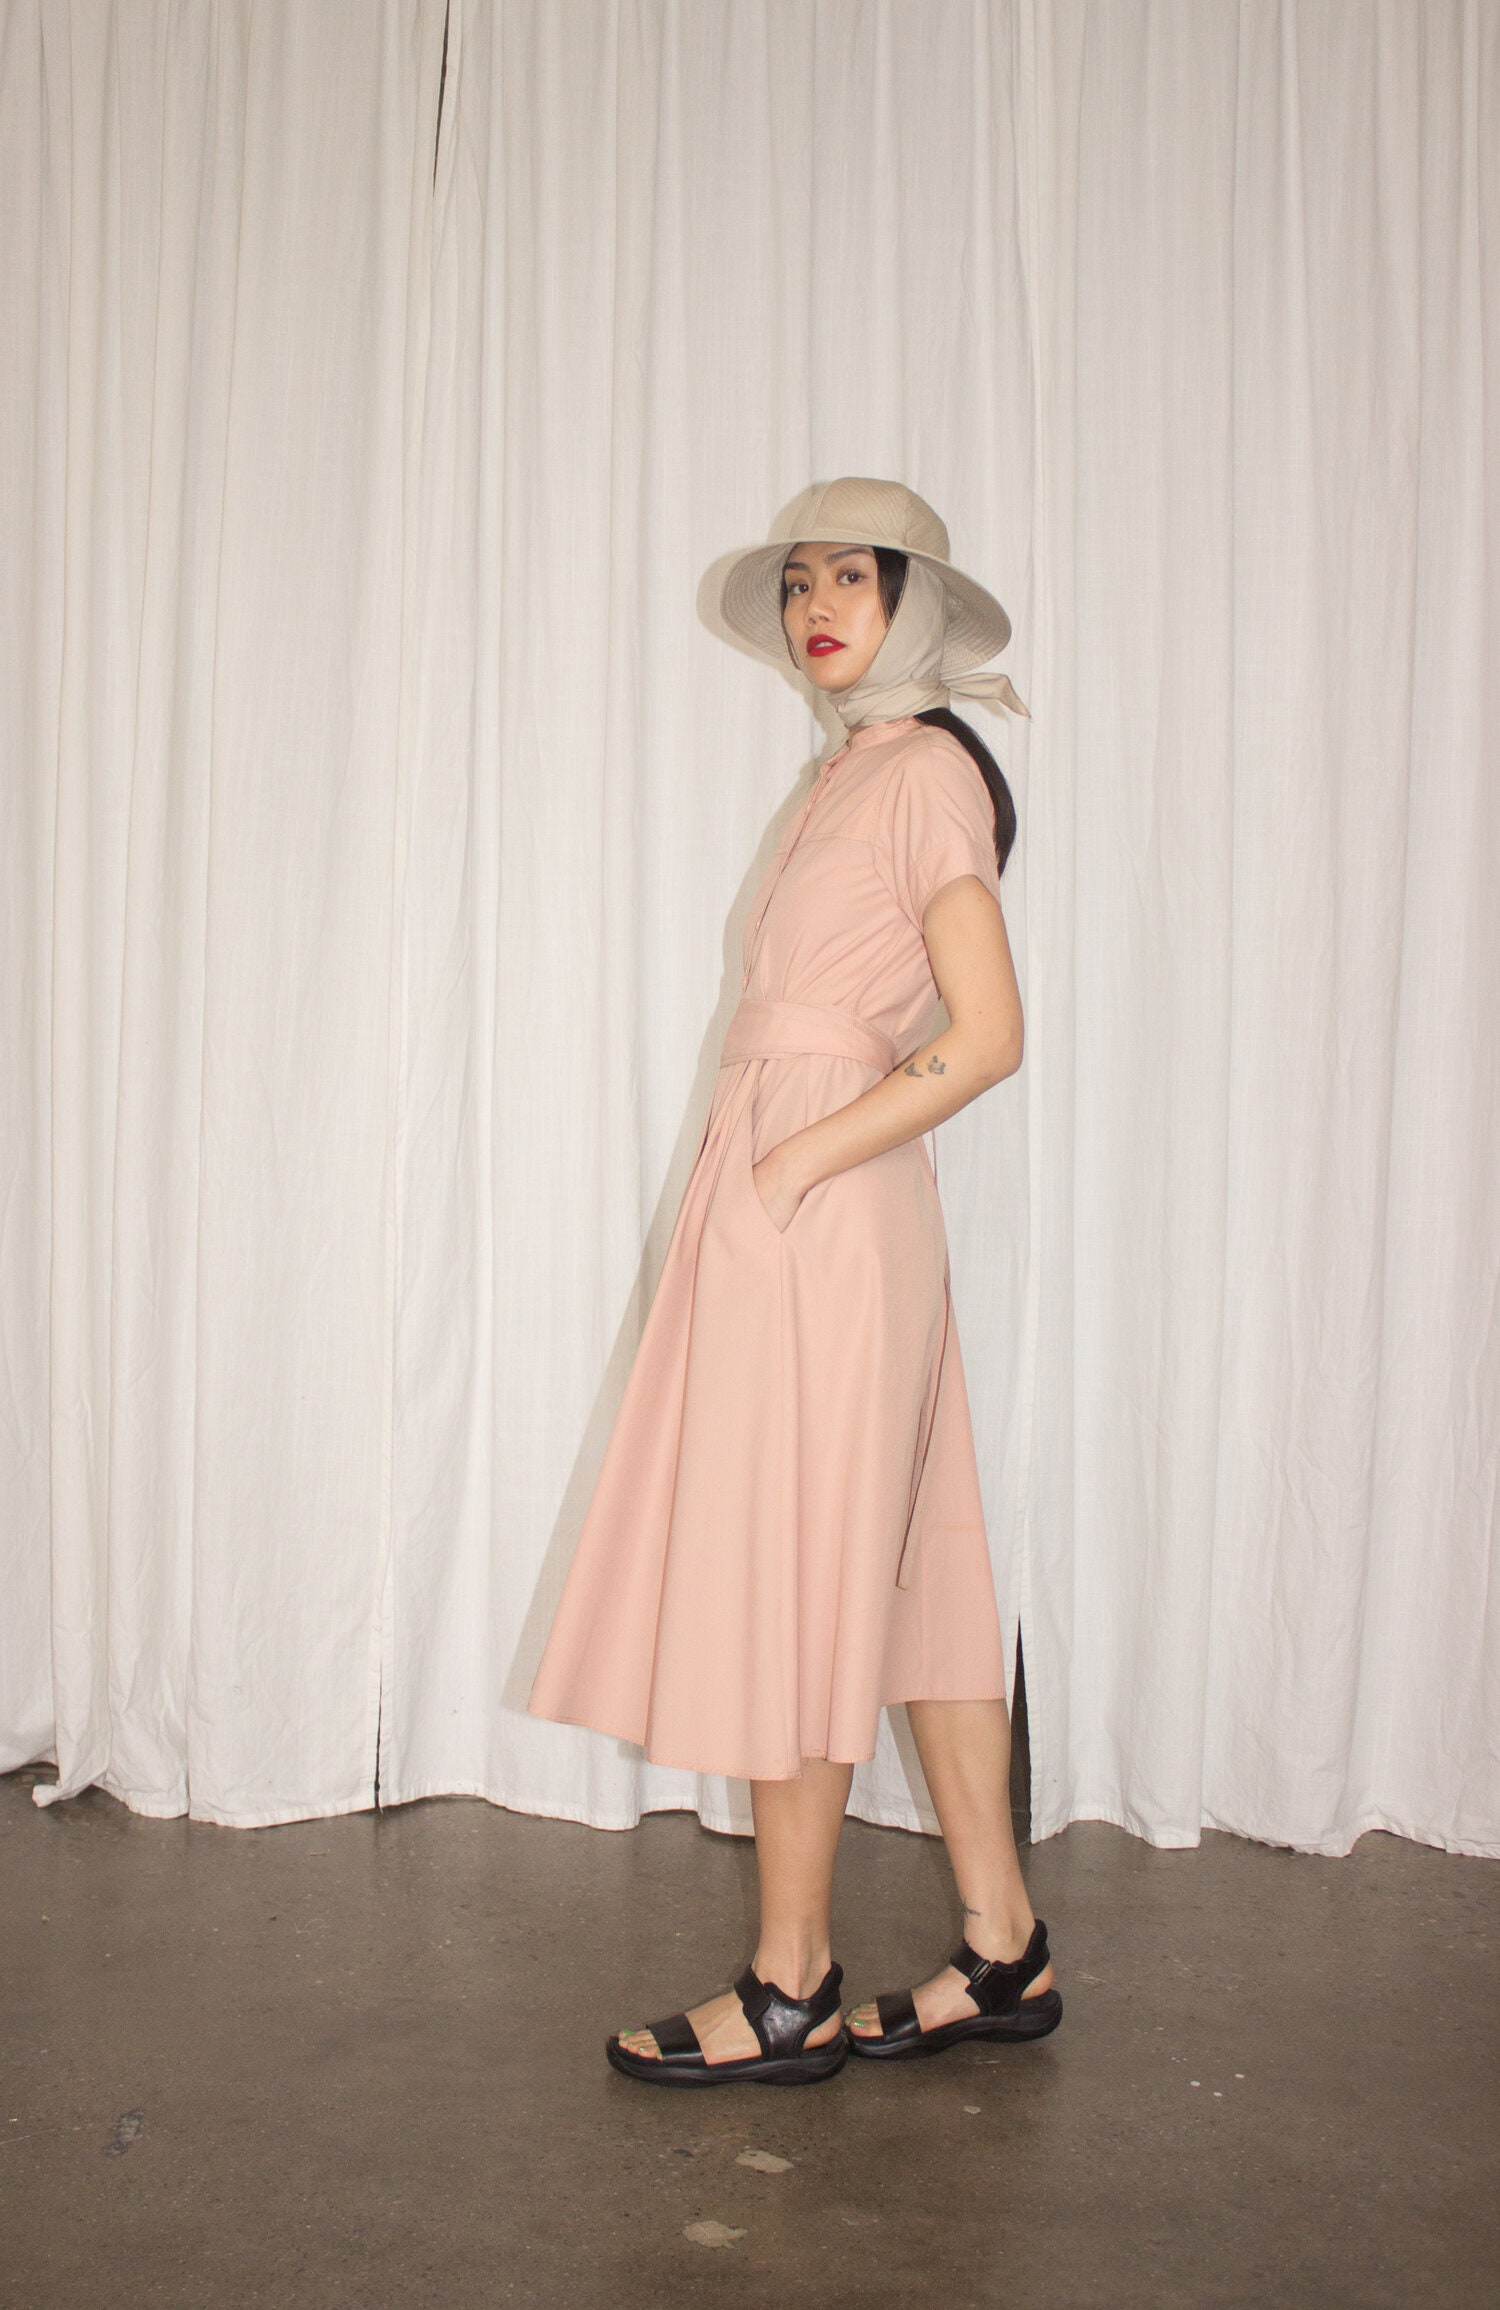 80s Dresses | Casual to Party Dresses 1980S Dusty Rose Cotton Shirt Dress $0.00 AT vintagedancer.com